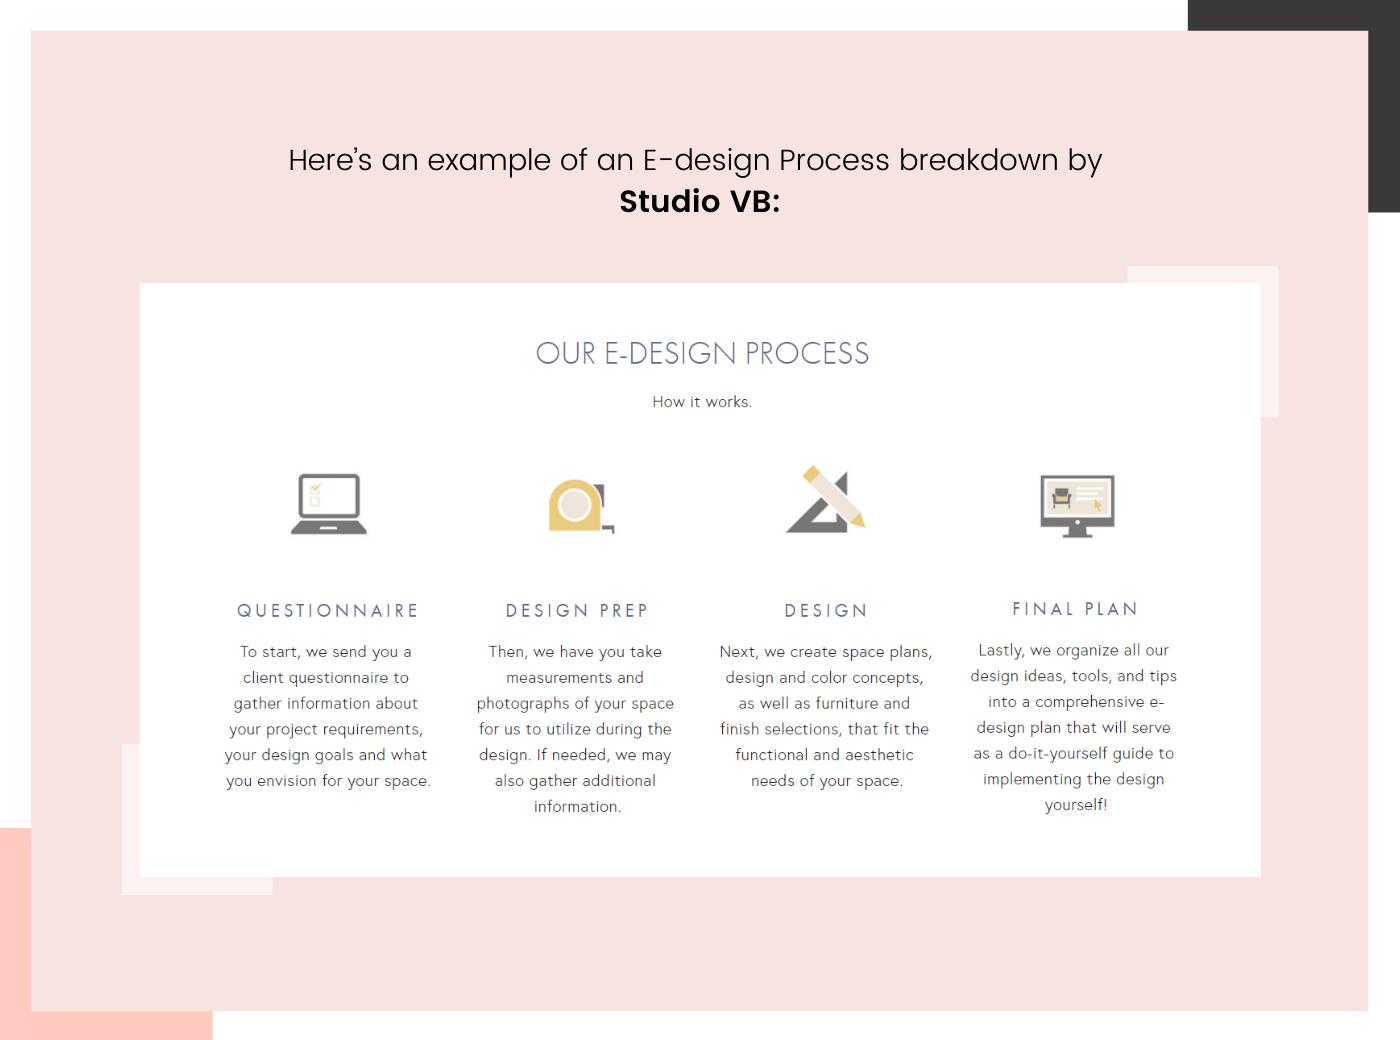 e-design process by studio VB